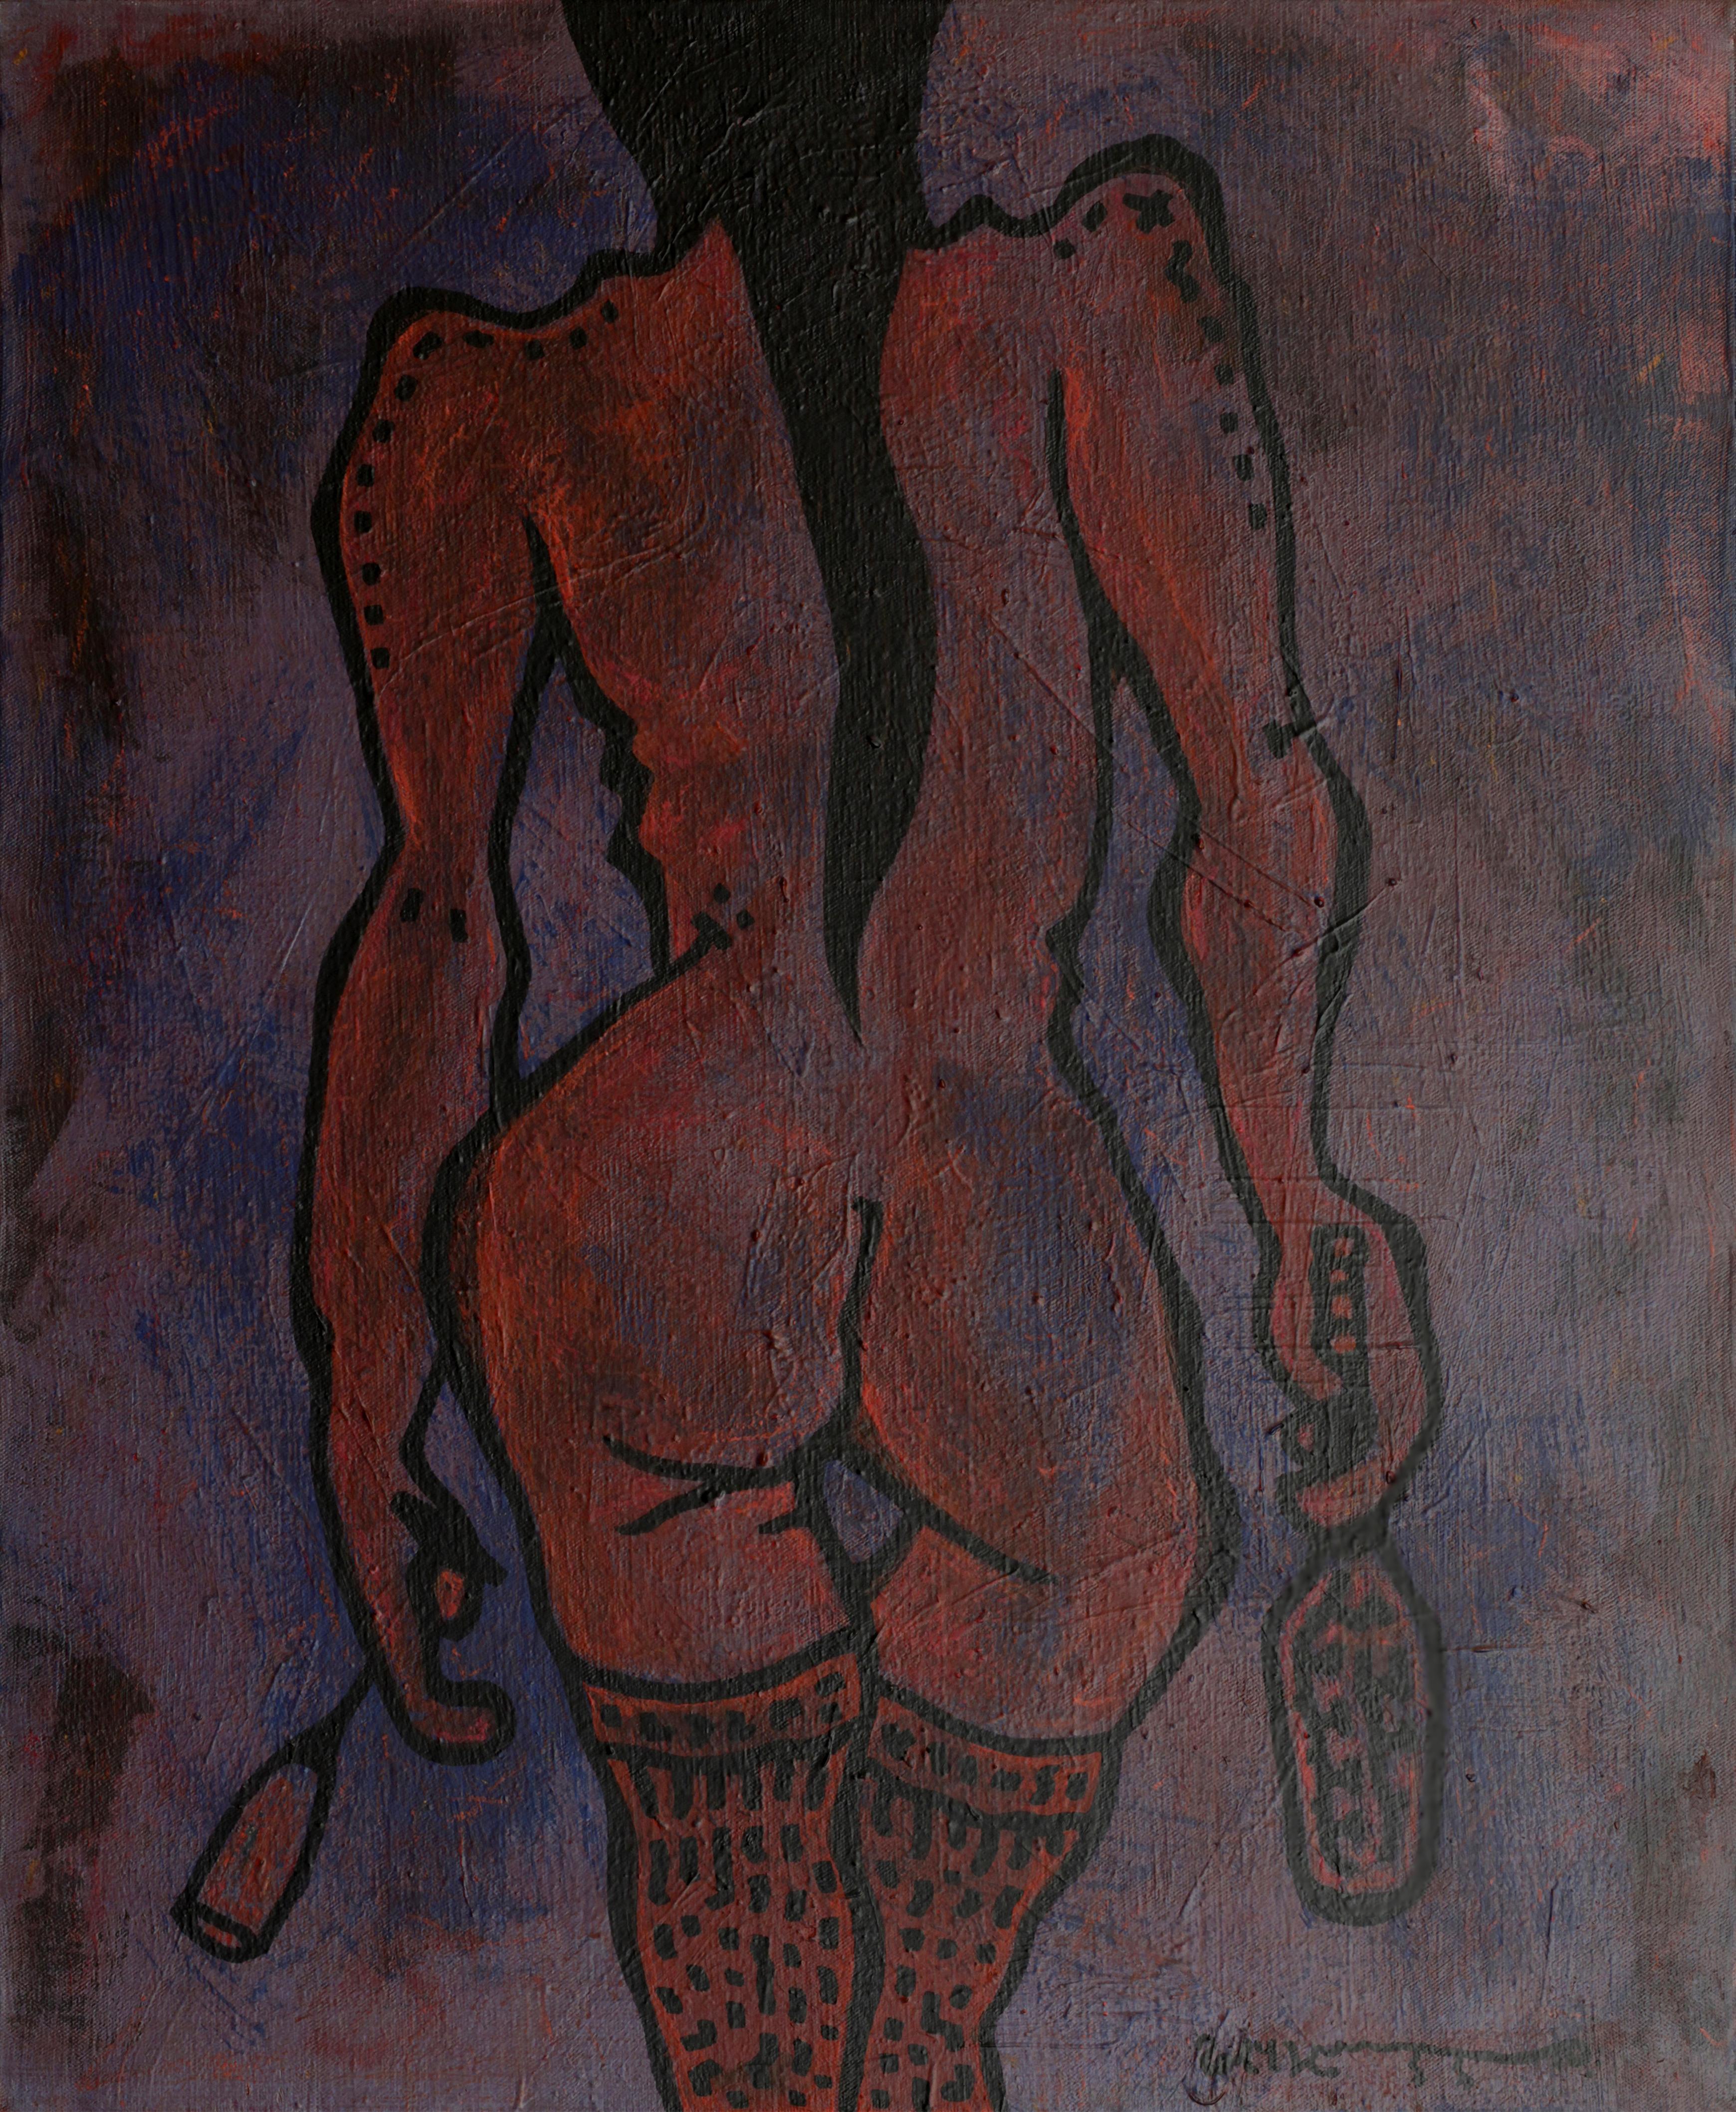 Summer, Woman Nude Erotic Art Naked Female Expressionist Painting Purple Orange